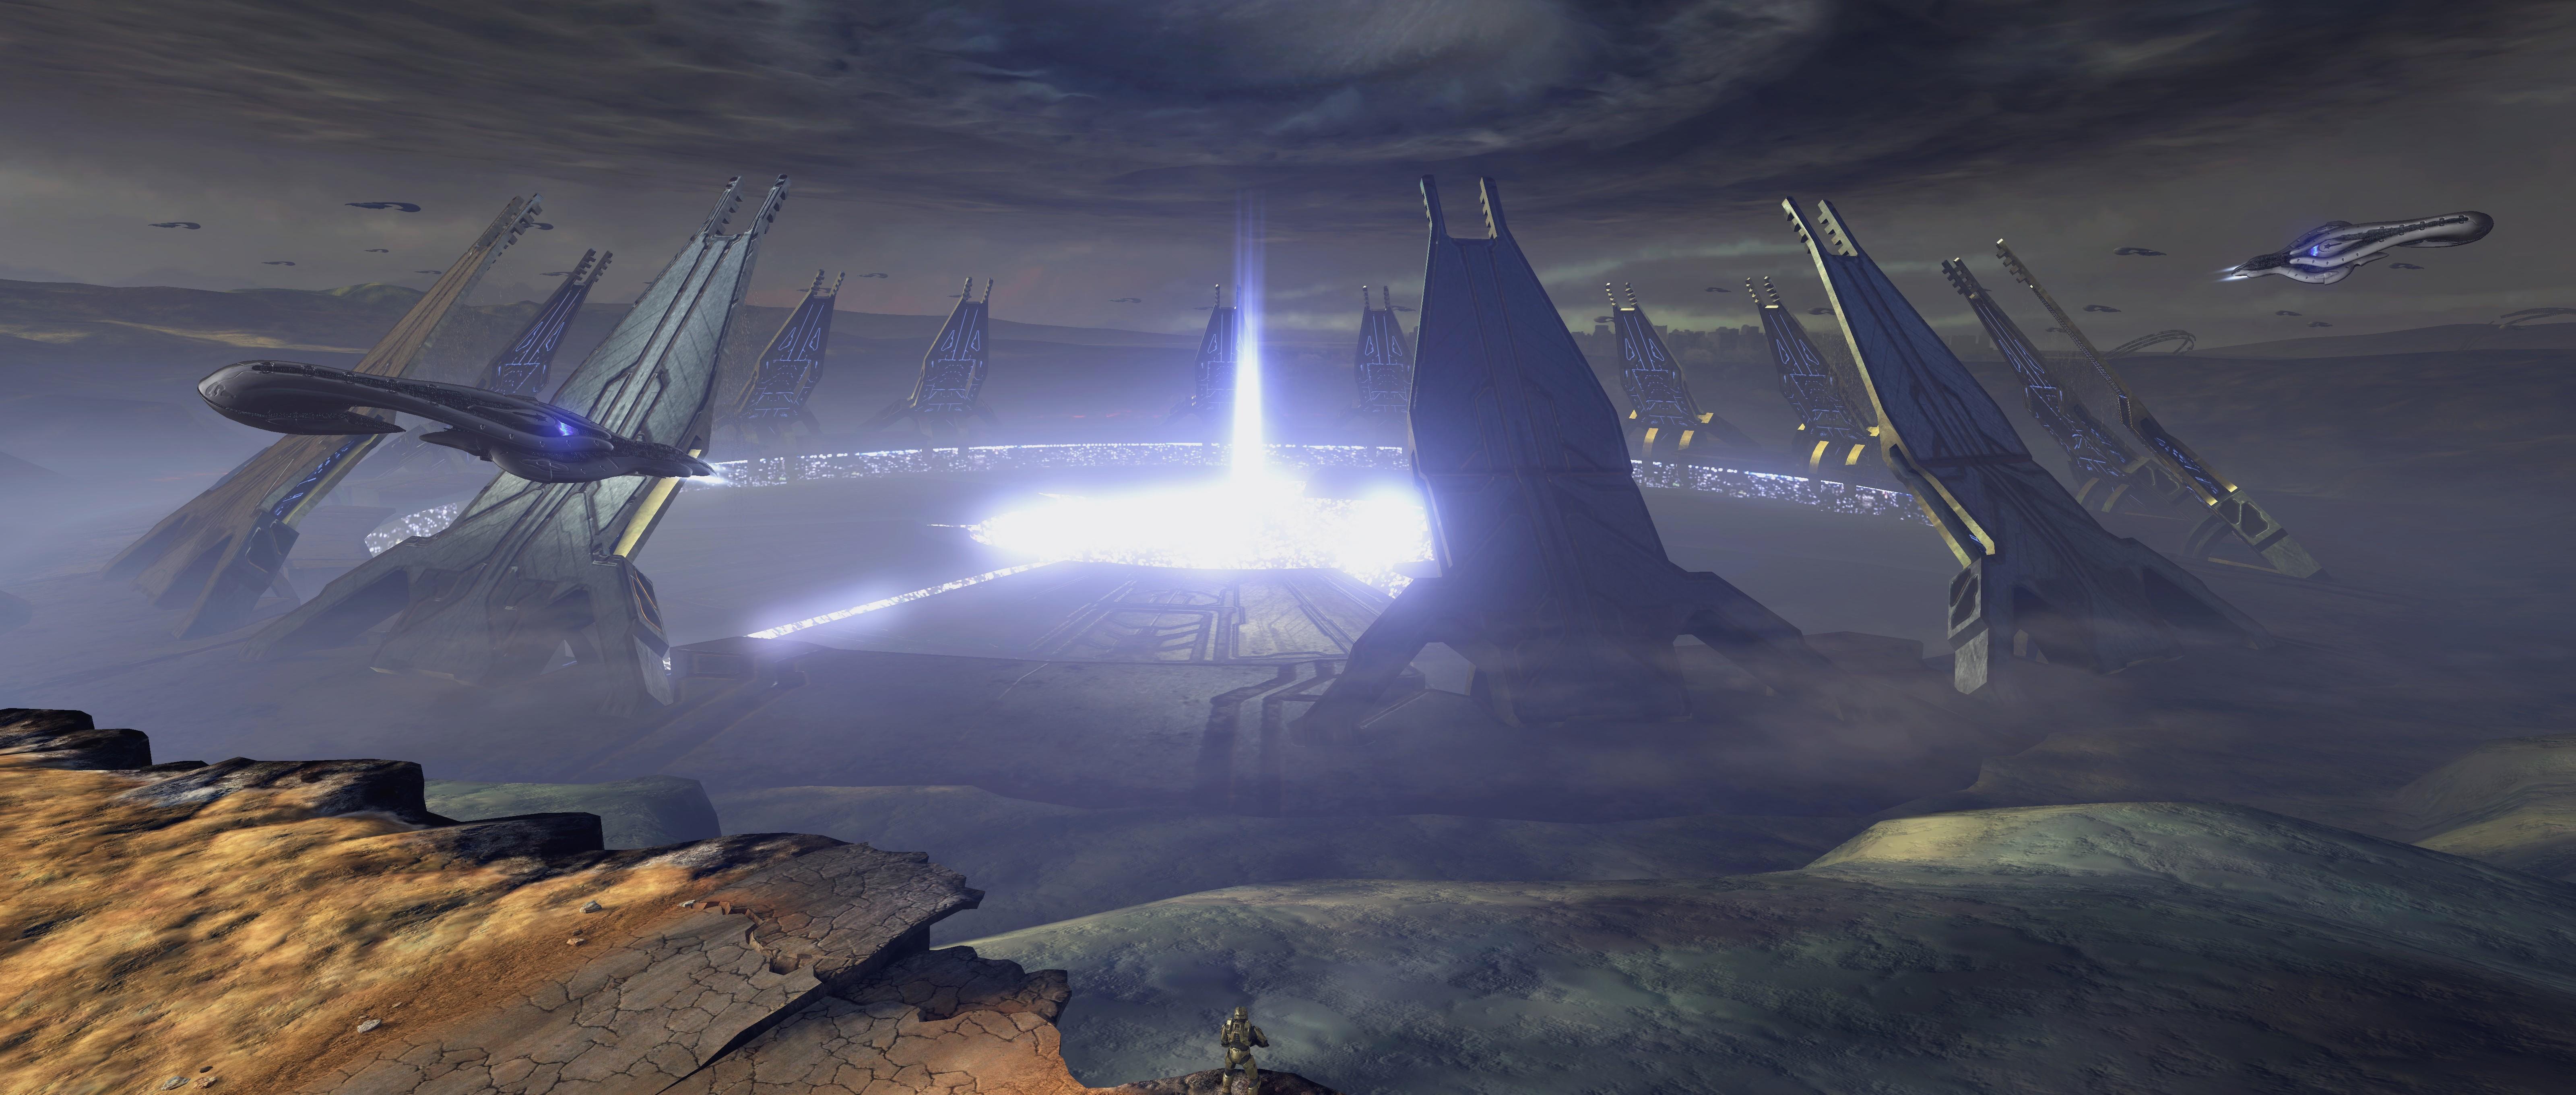 Halo 3 Wallpaper Hd Download